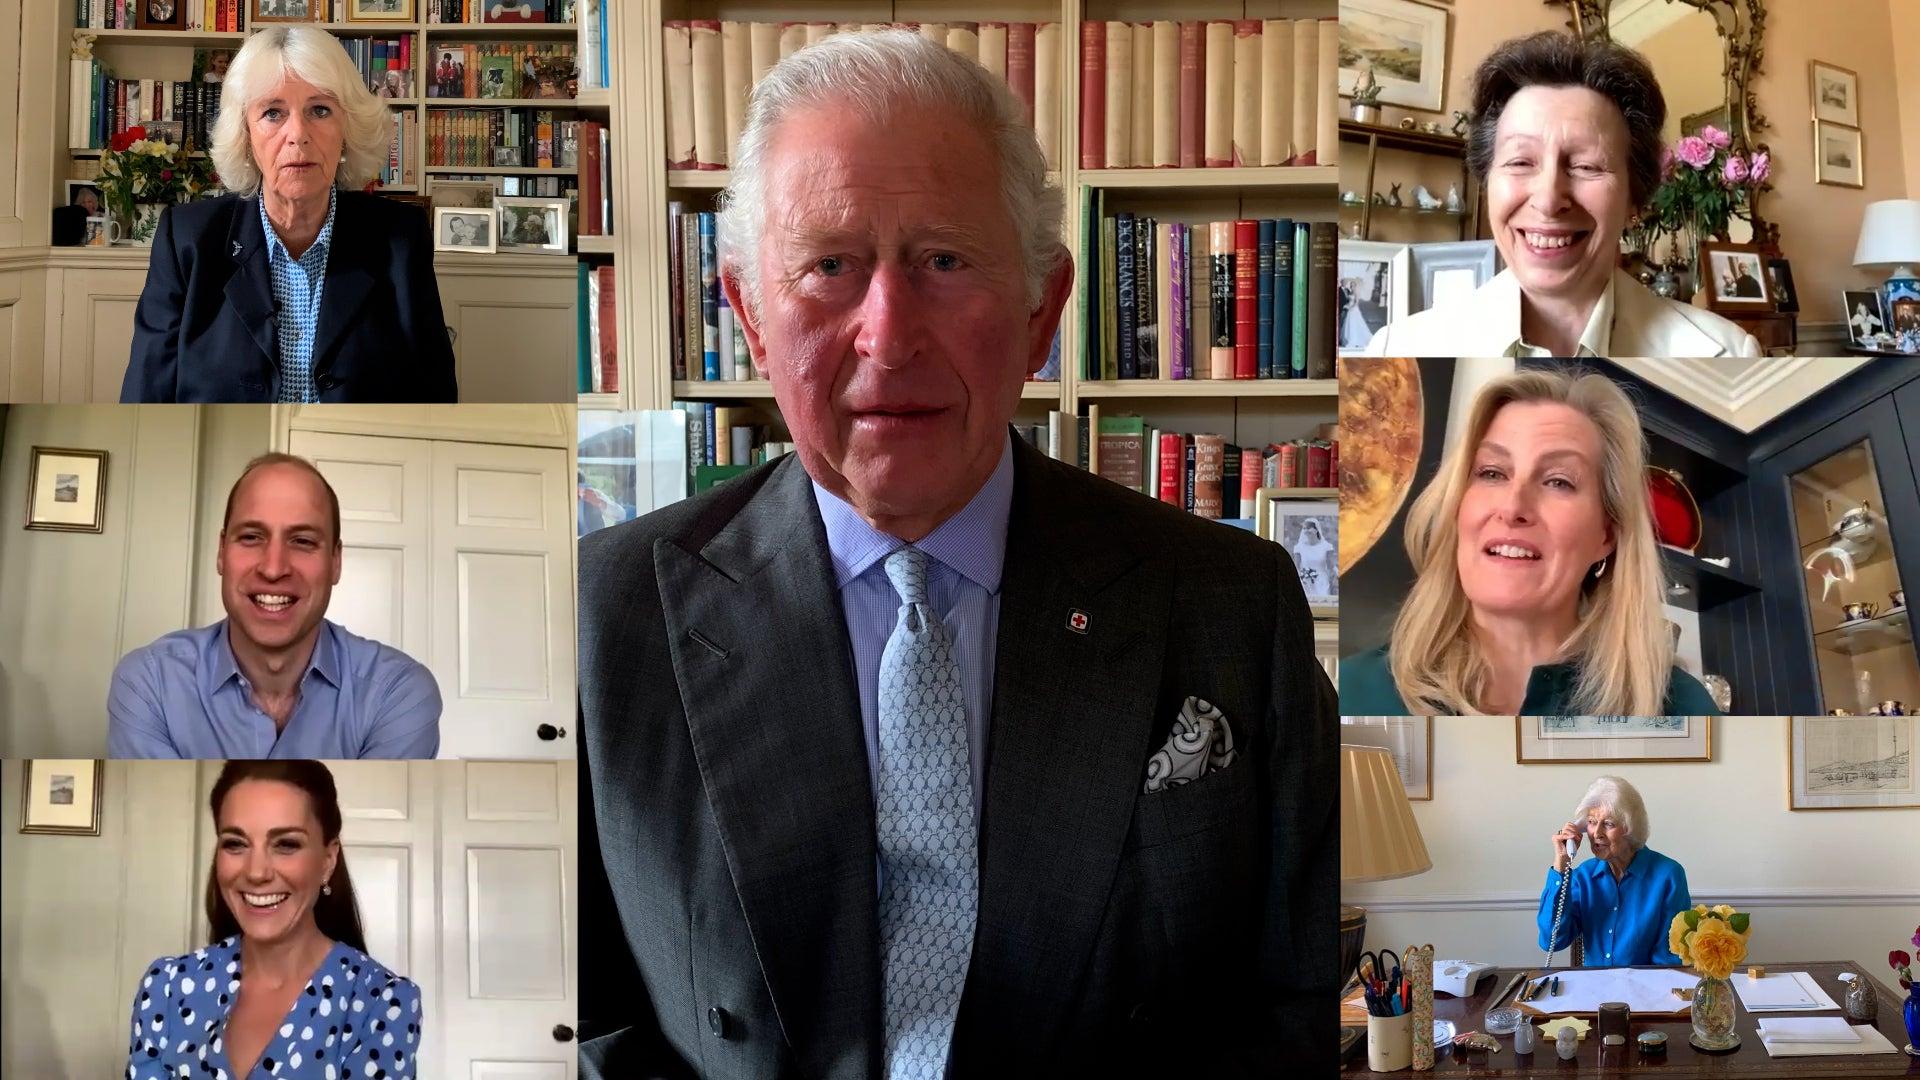 International Nurses Day: Members of royal family team up to call nurses around the world